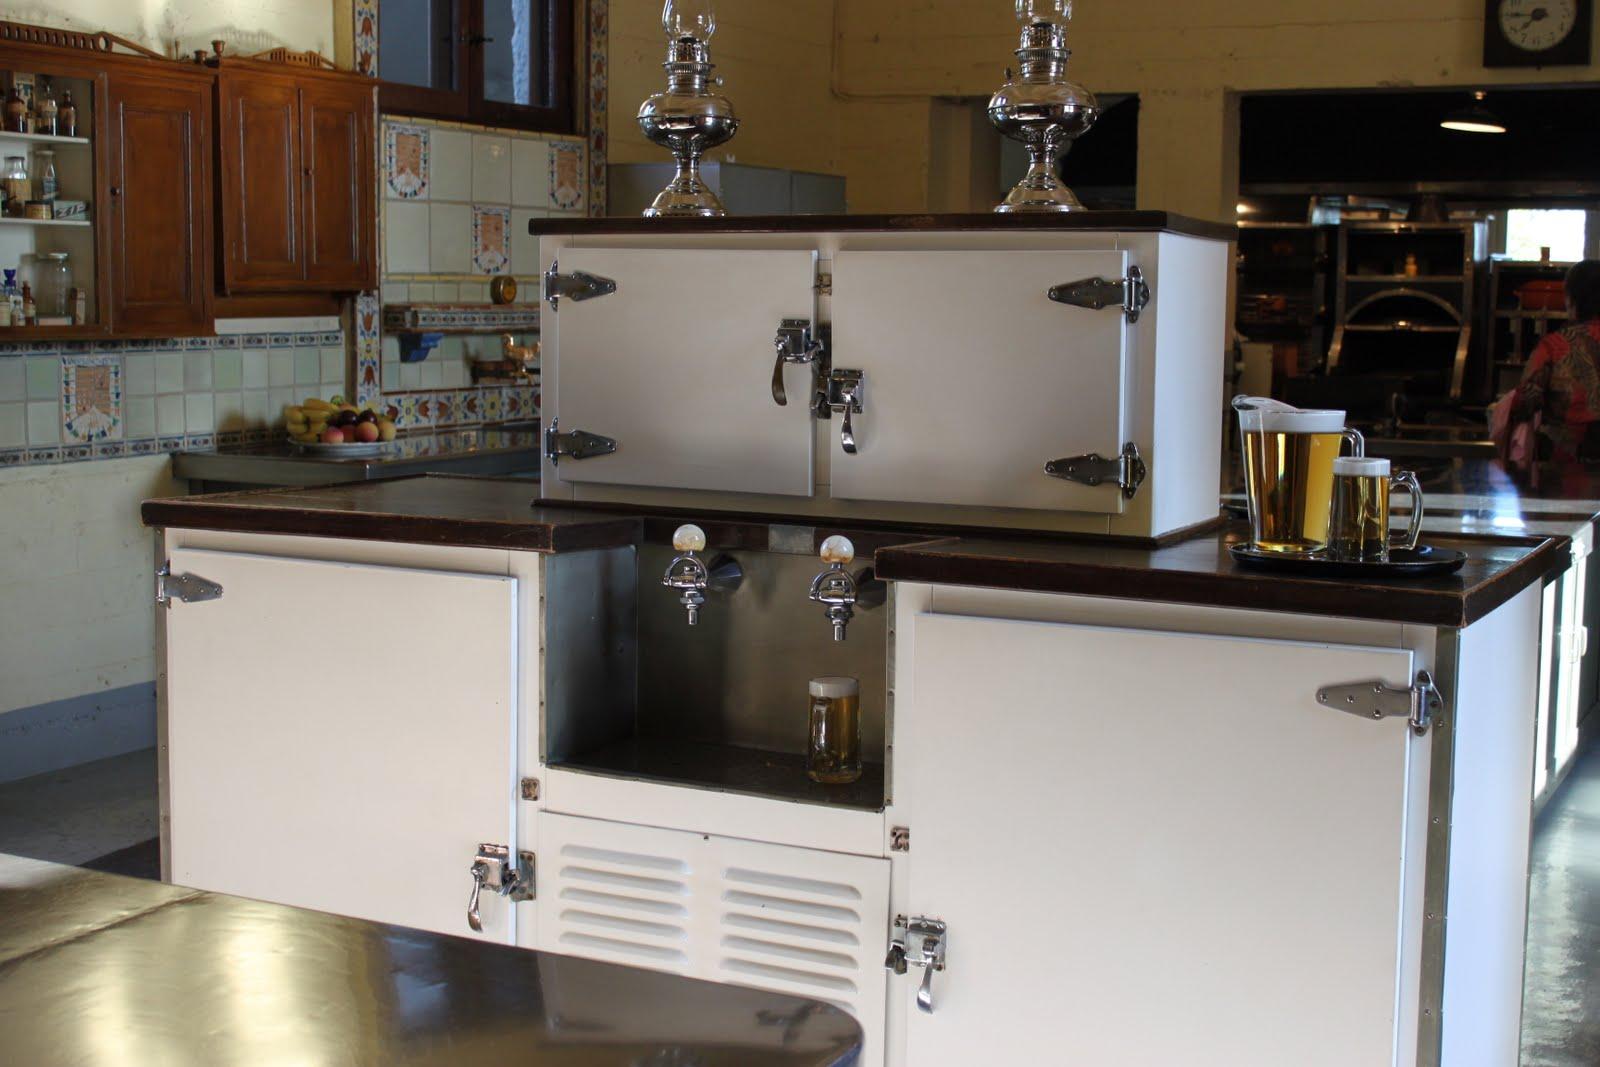 German Kitchen Faucets